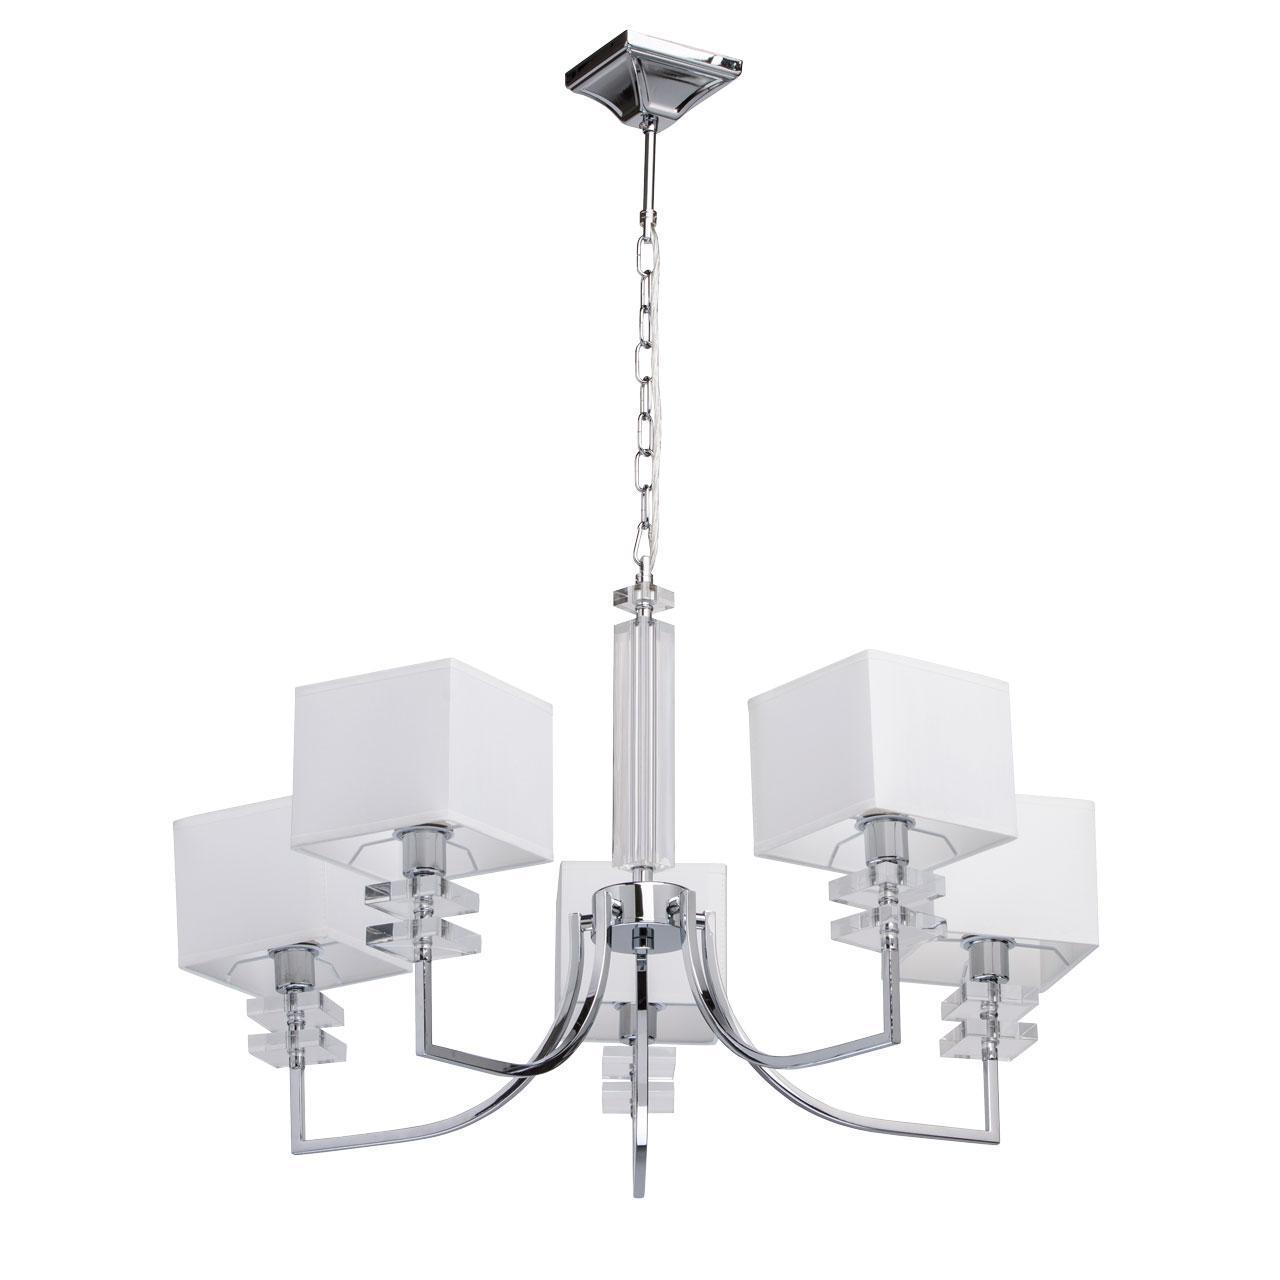 Люстра MW-Light Прато 1 101010305 подвесная бра mw light прато 101022501